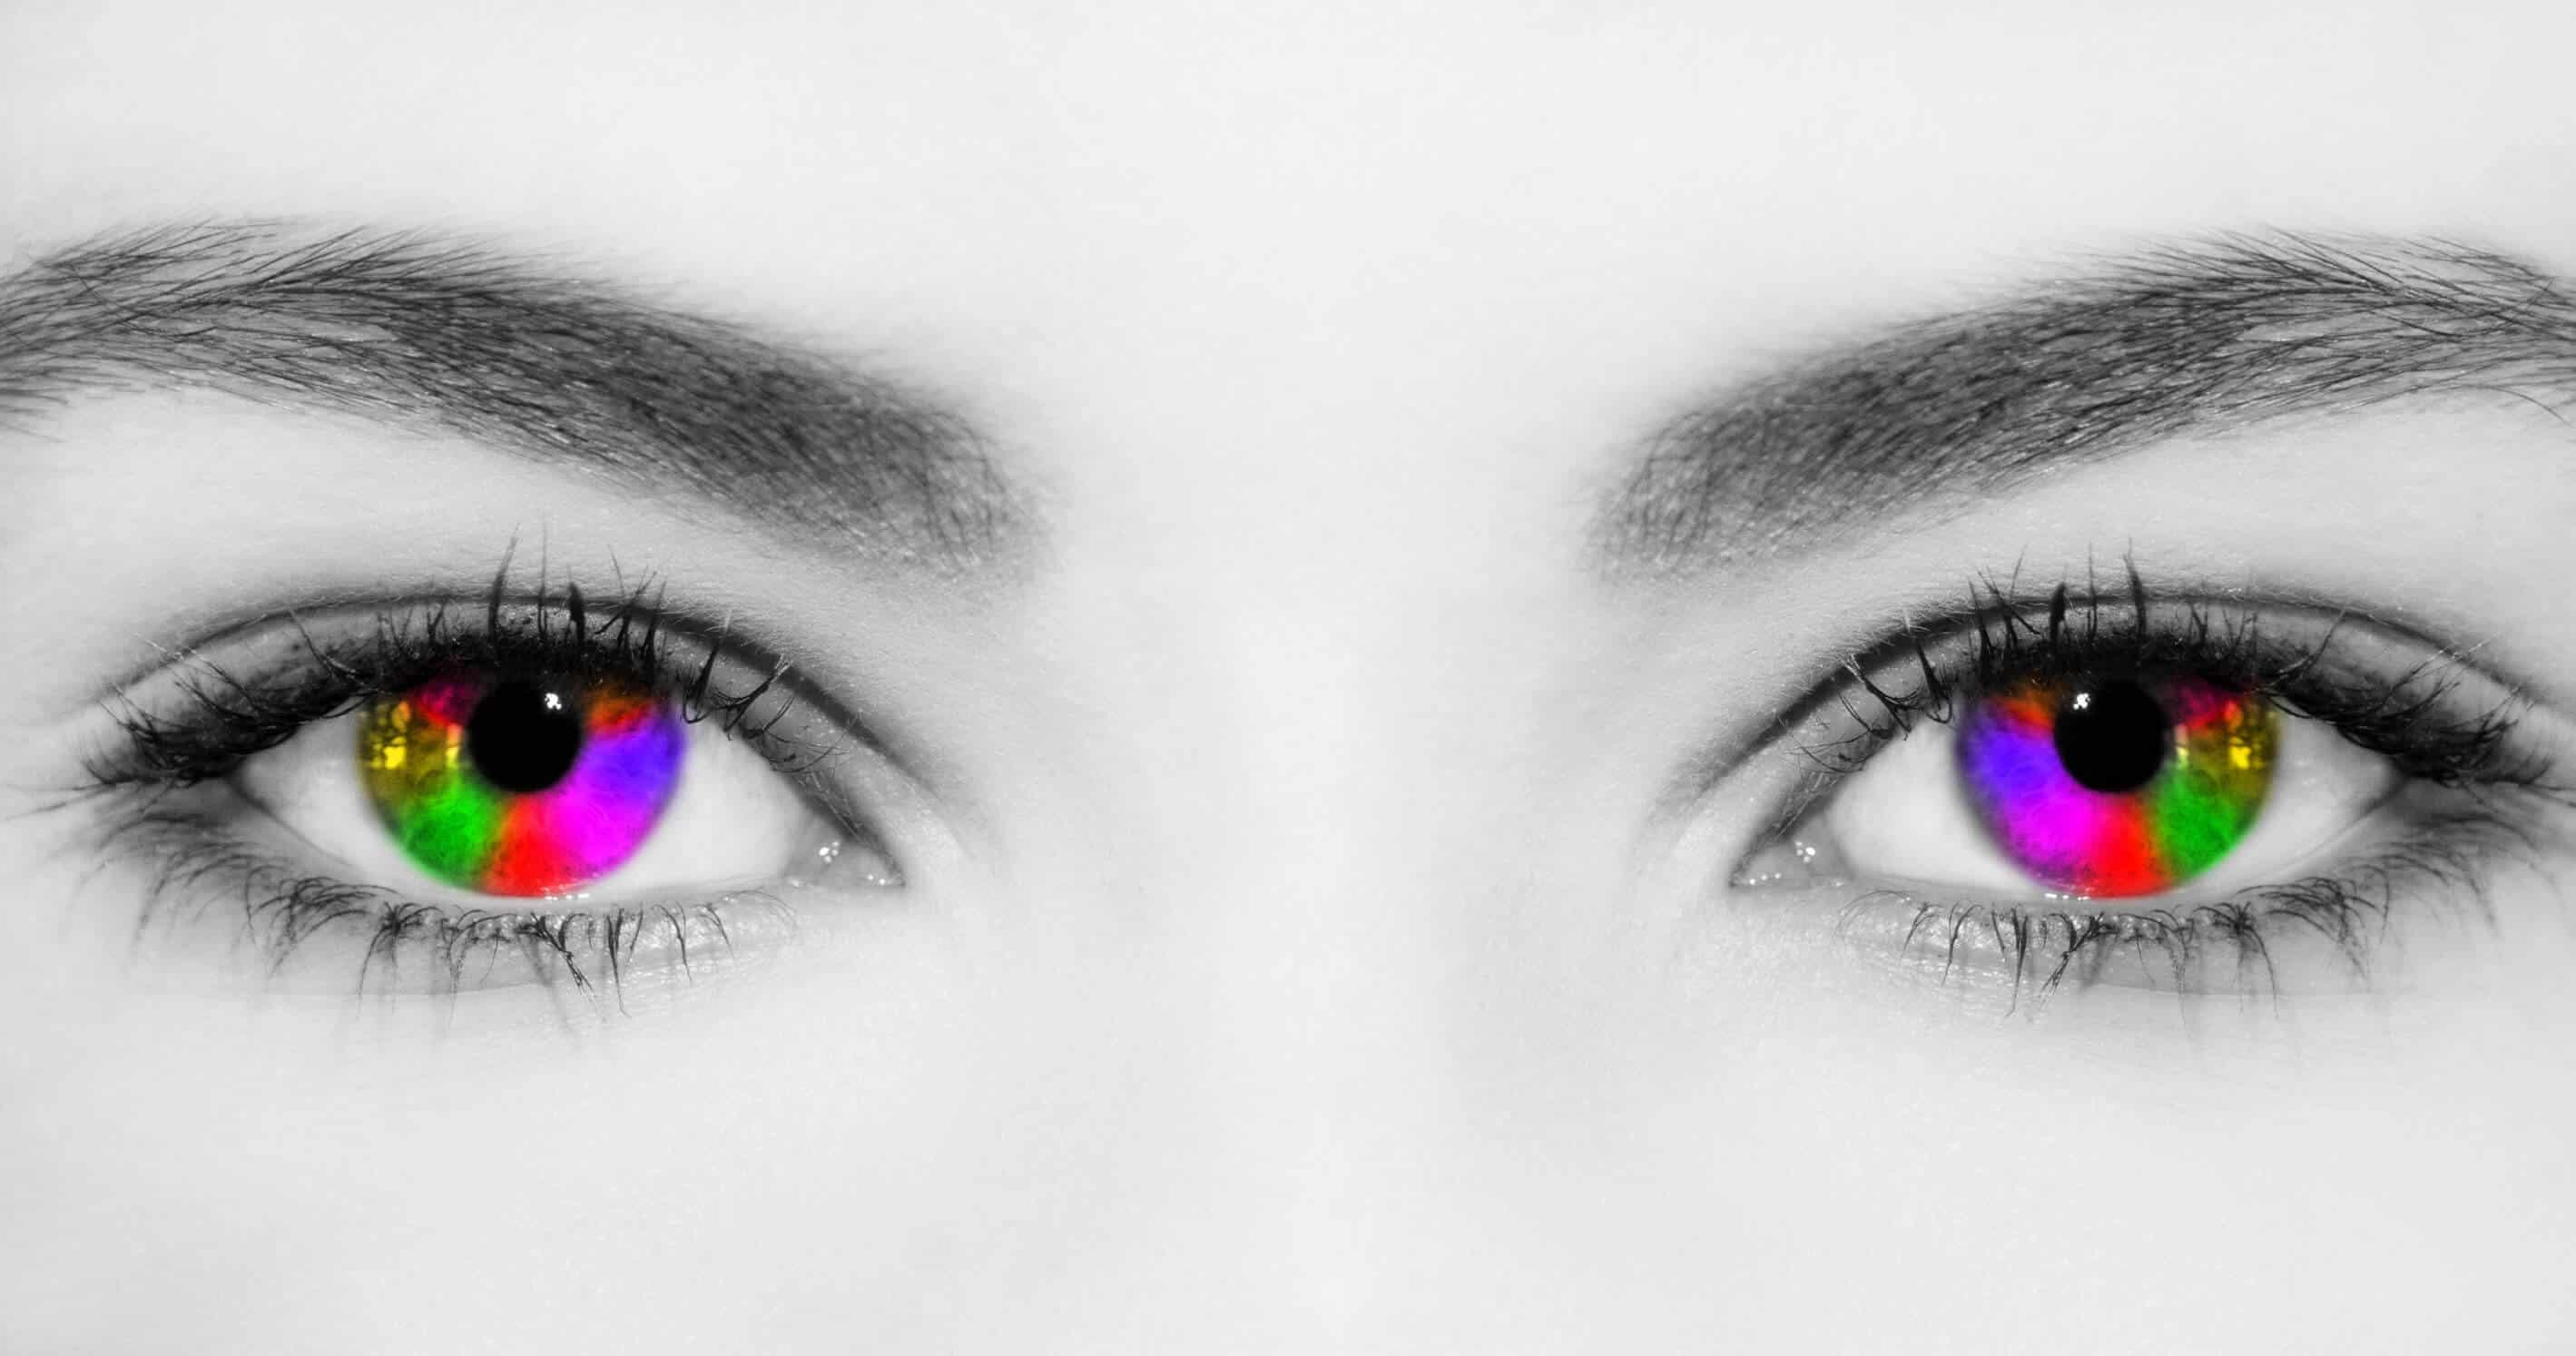 Farbige-Augen-Grafik